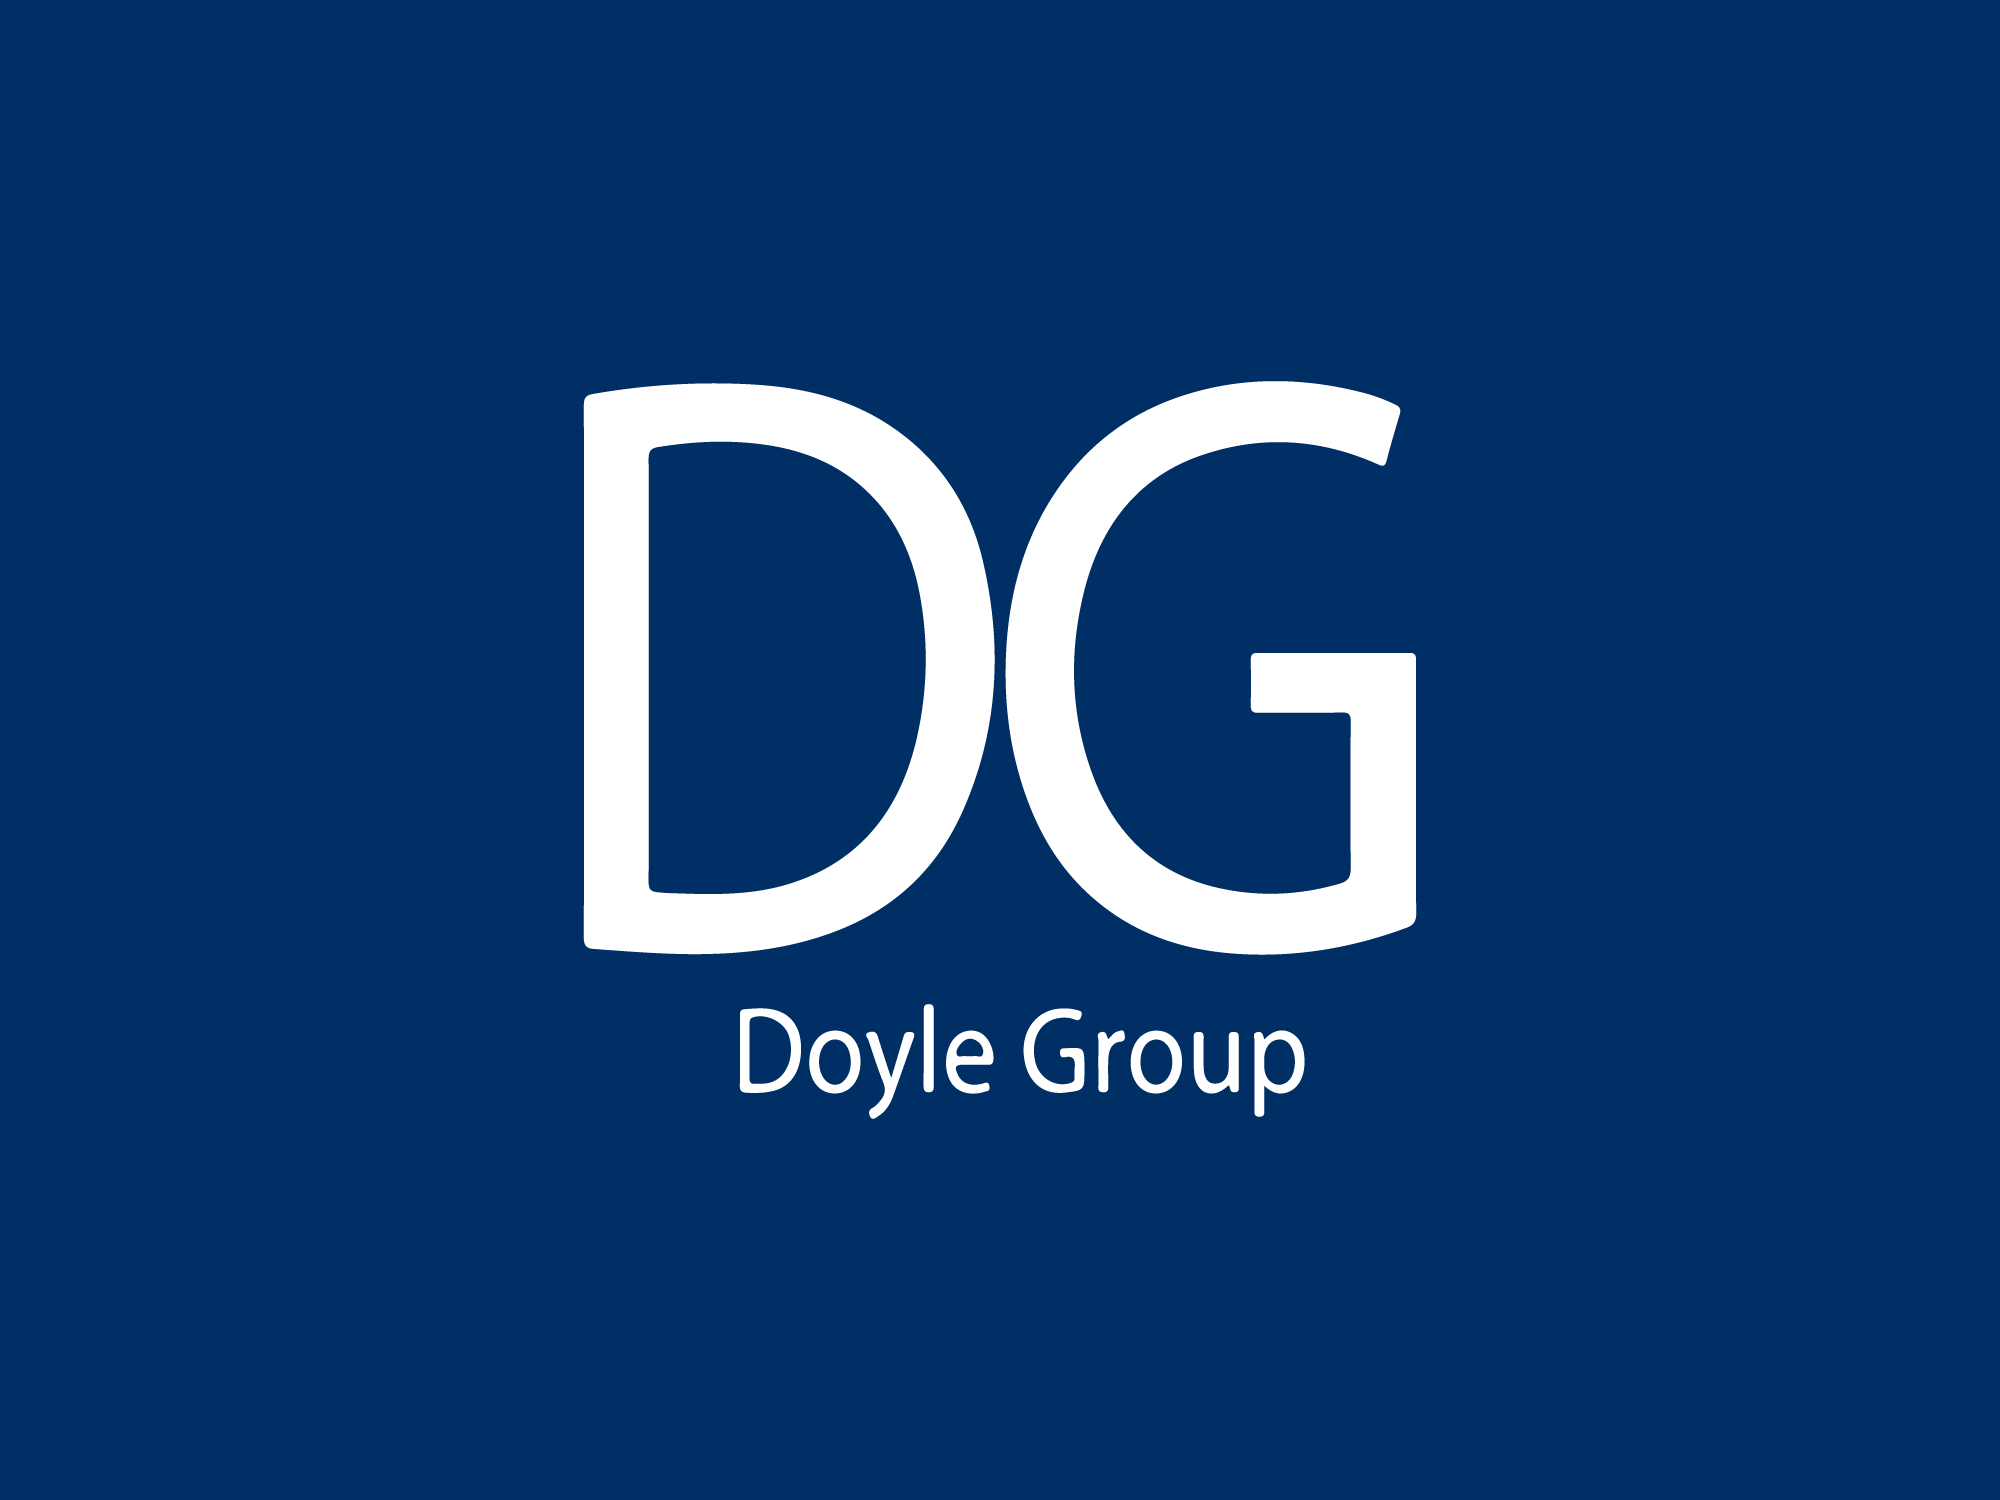 Doyle Group - Group Refinancing